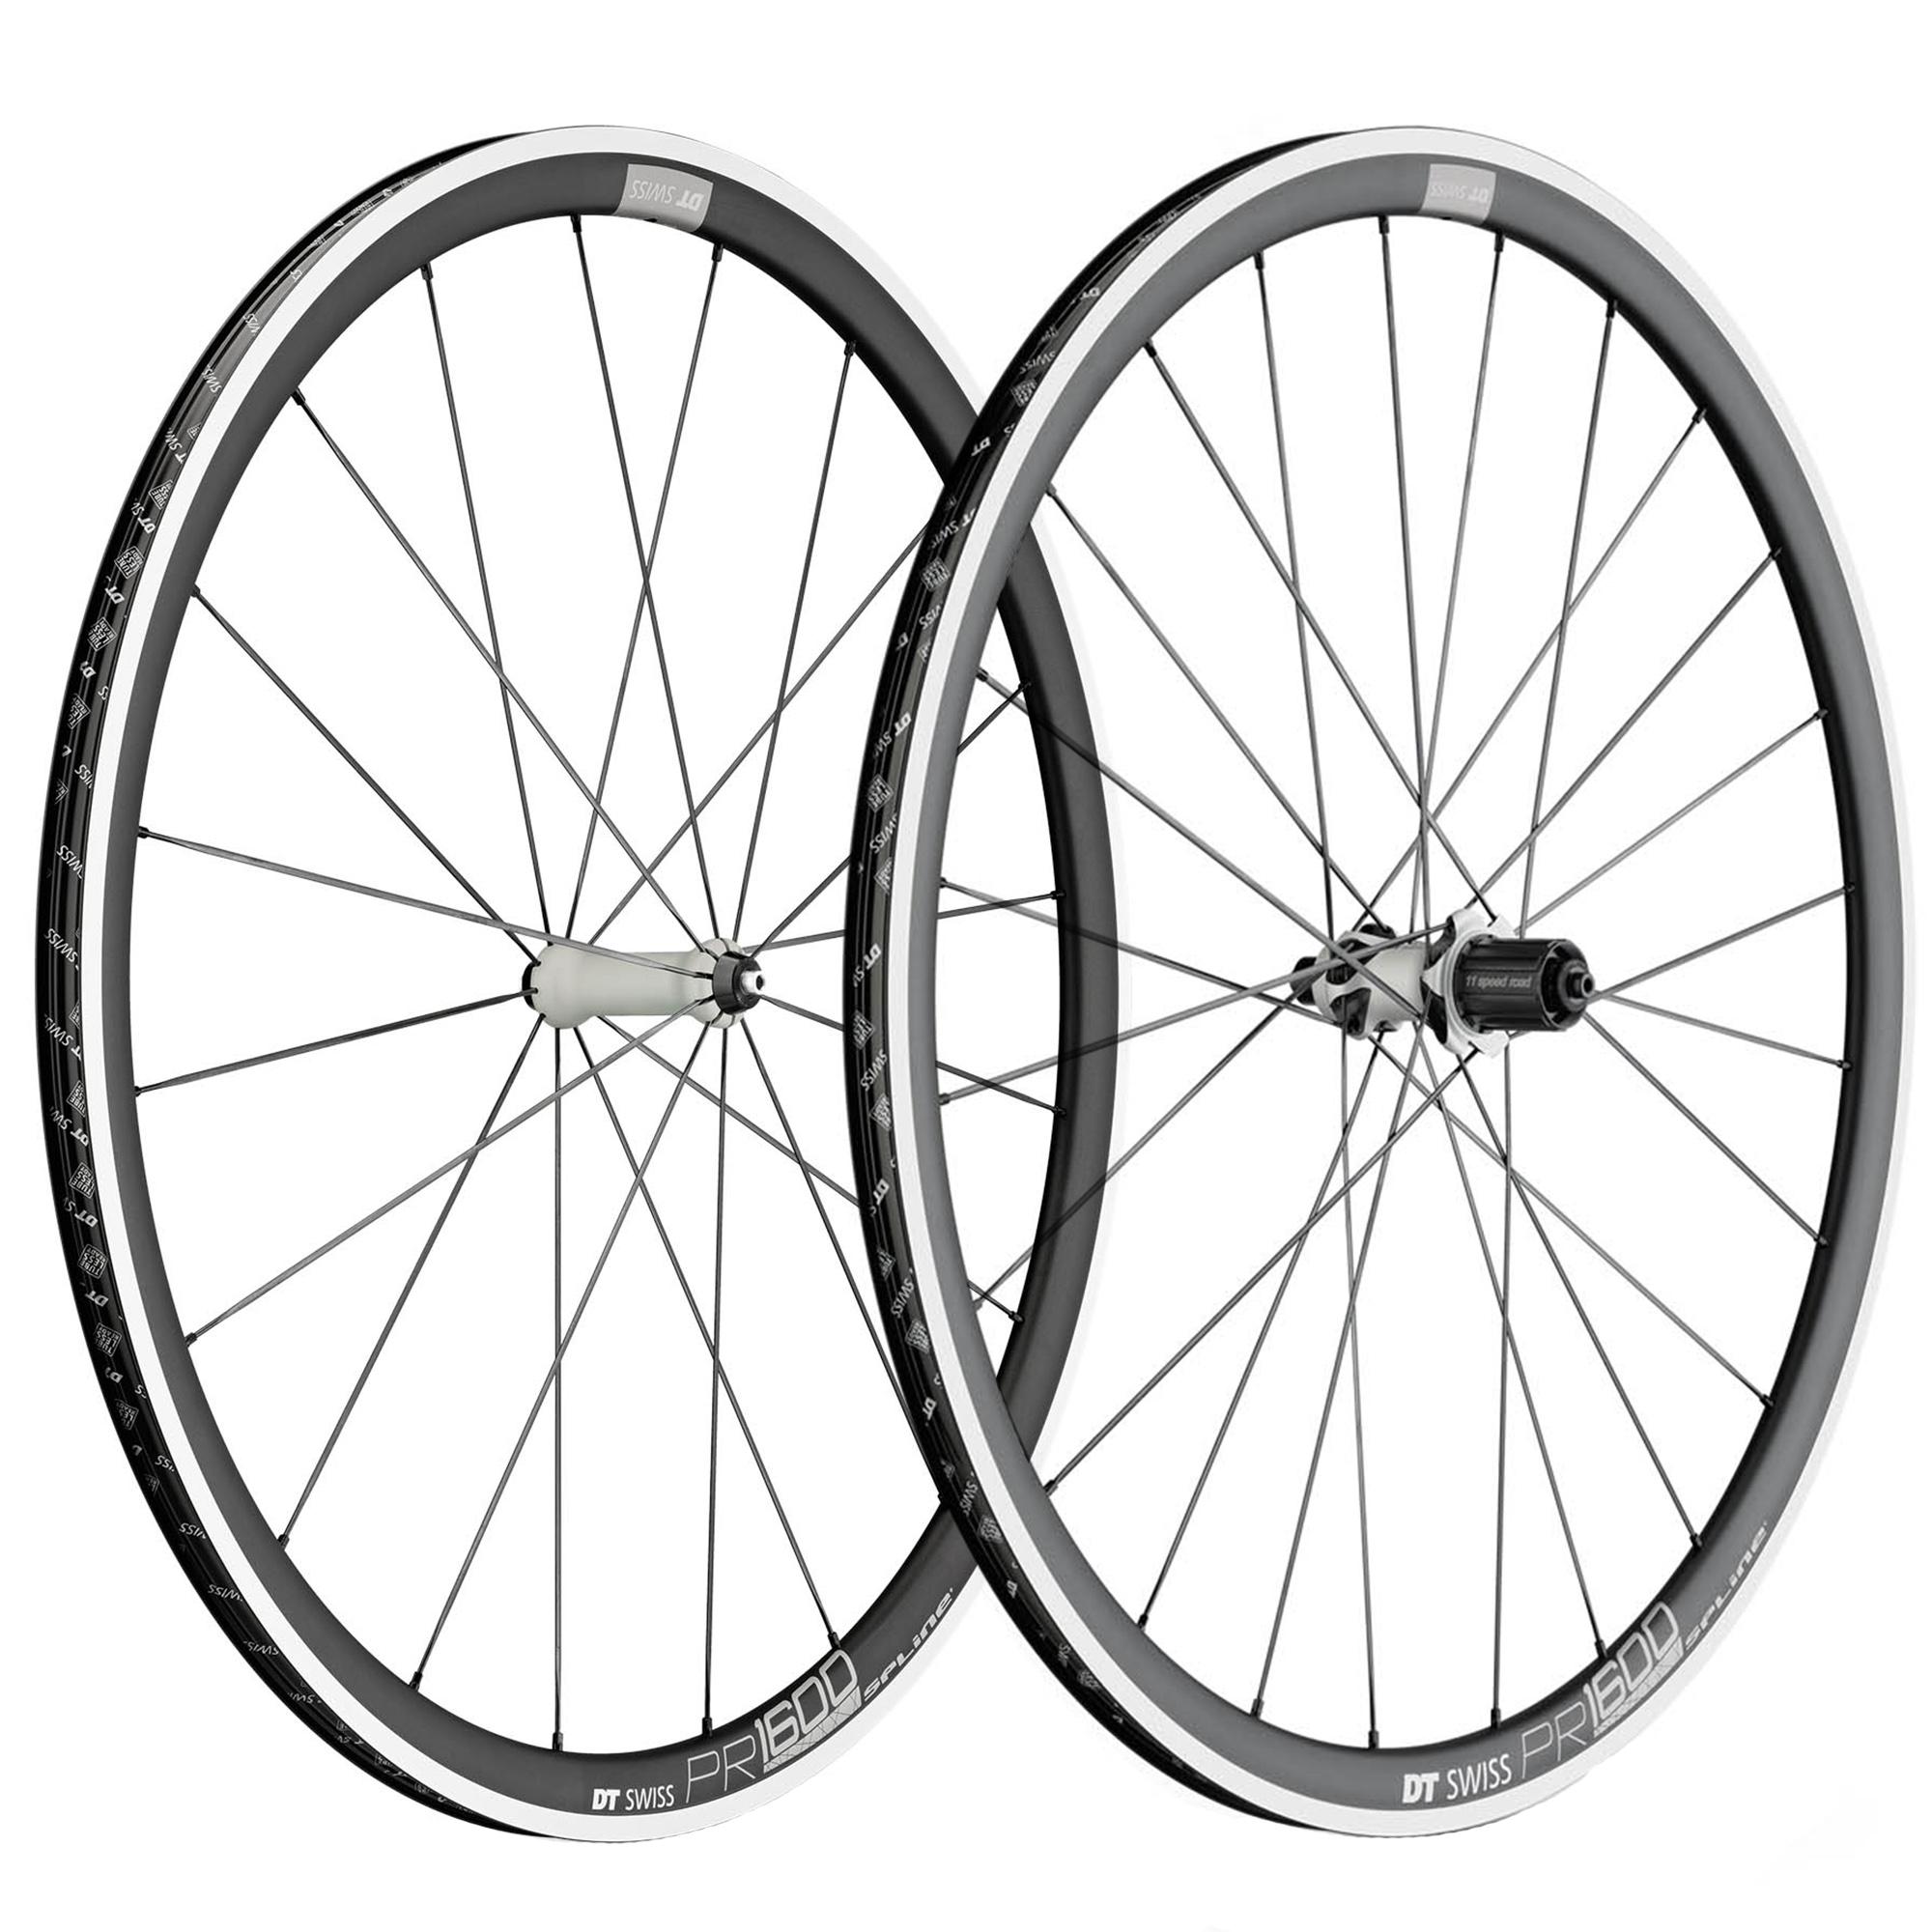 DT Swiss PR 1600 Spline 32 Clincher Road Wheelset - 700c